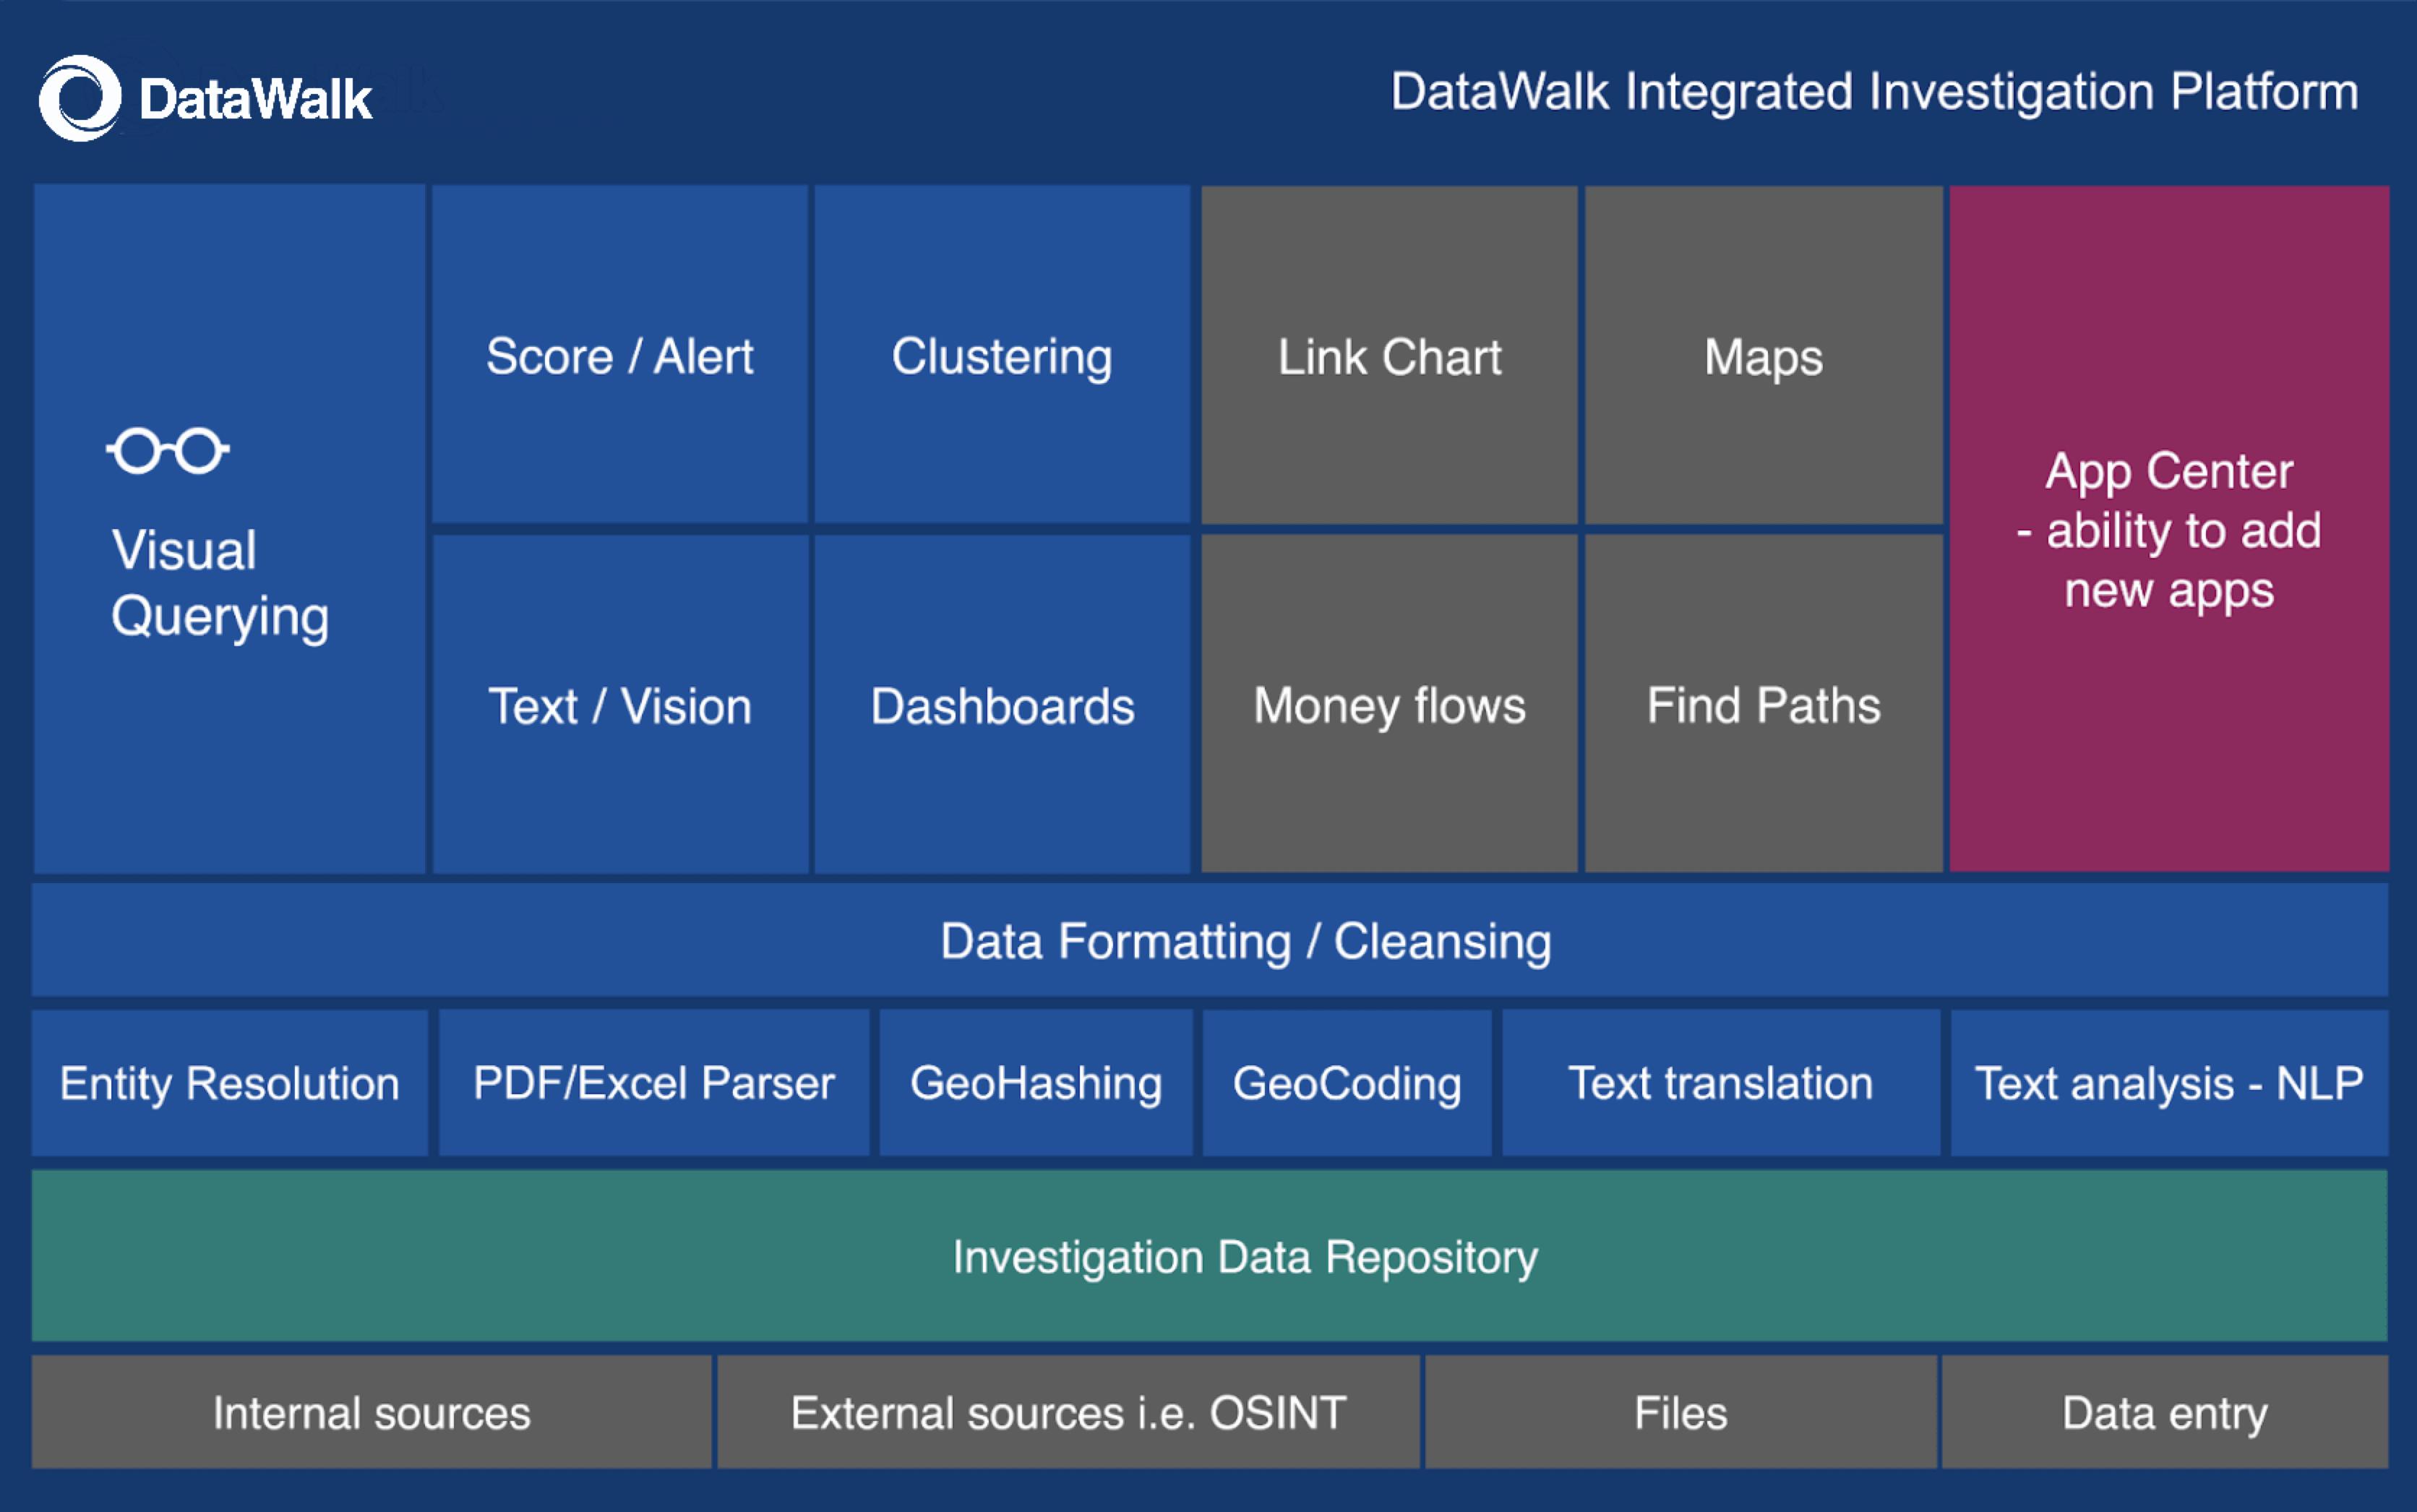 DataWalk integrated investigation platform